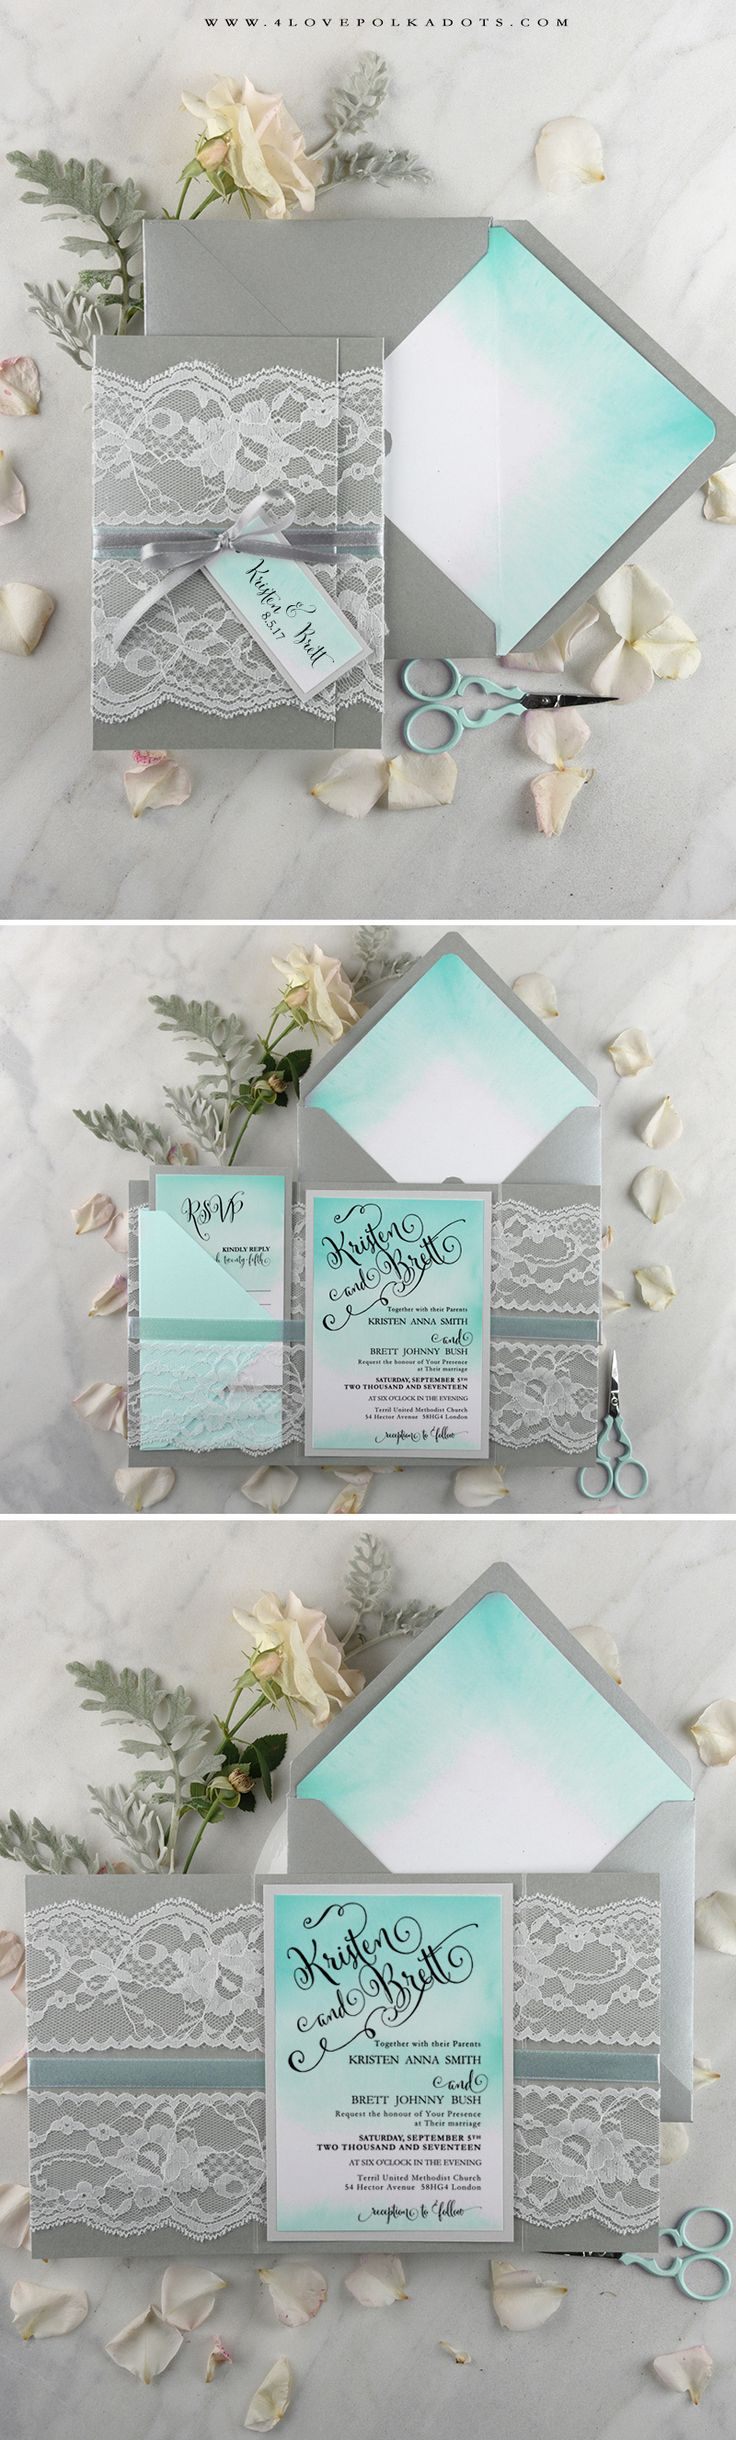 185 Best Xv Images On Pinterest Wedding Ideas Wedding Bridesmaid